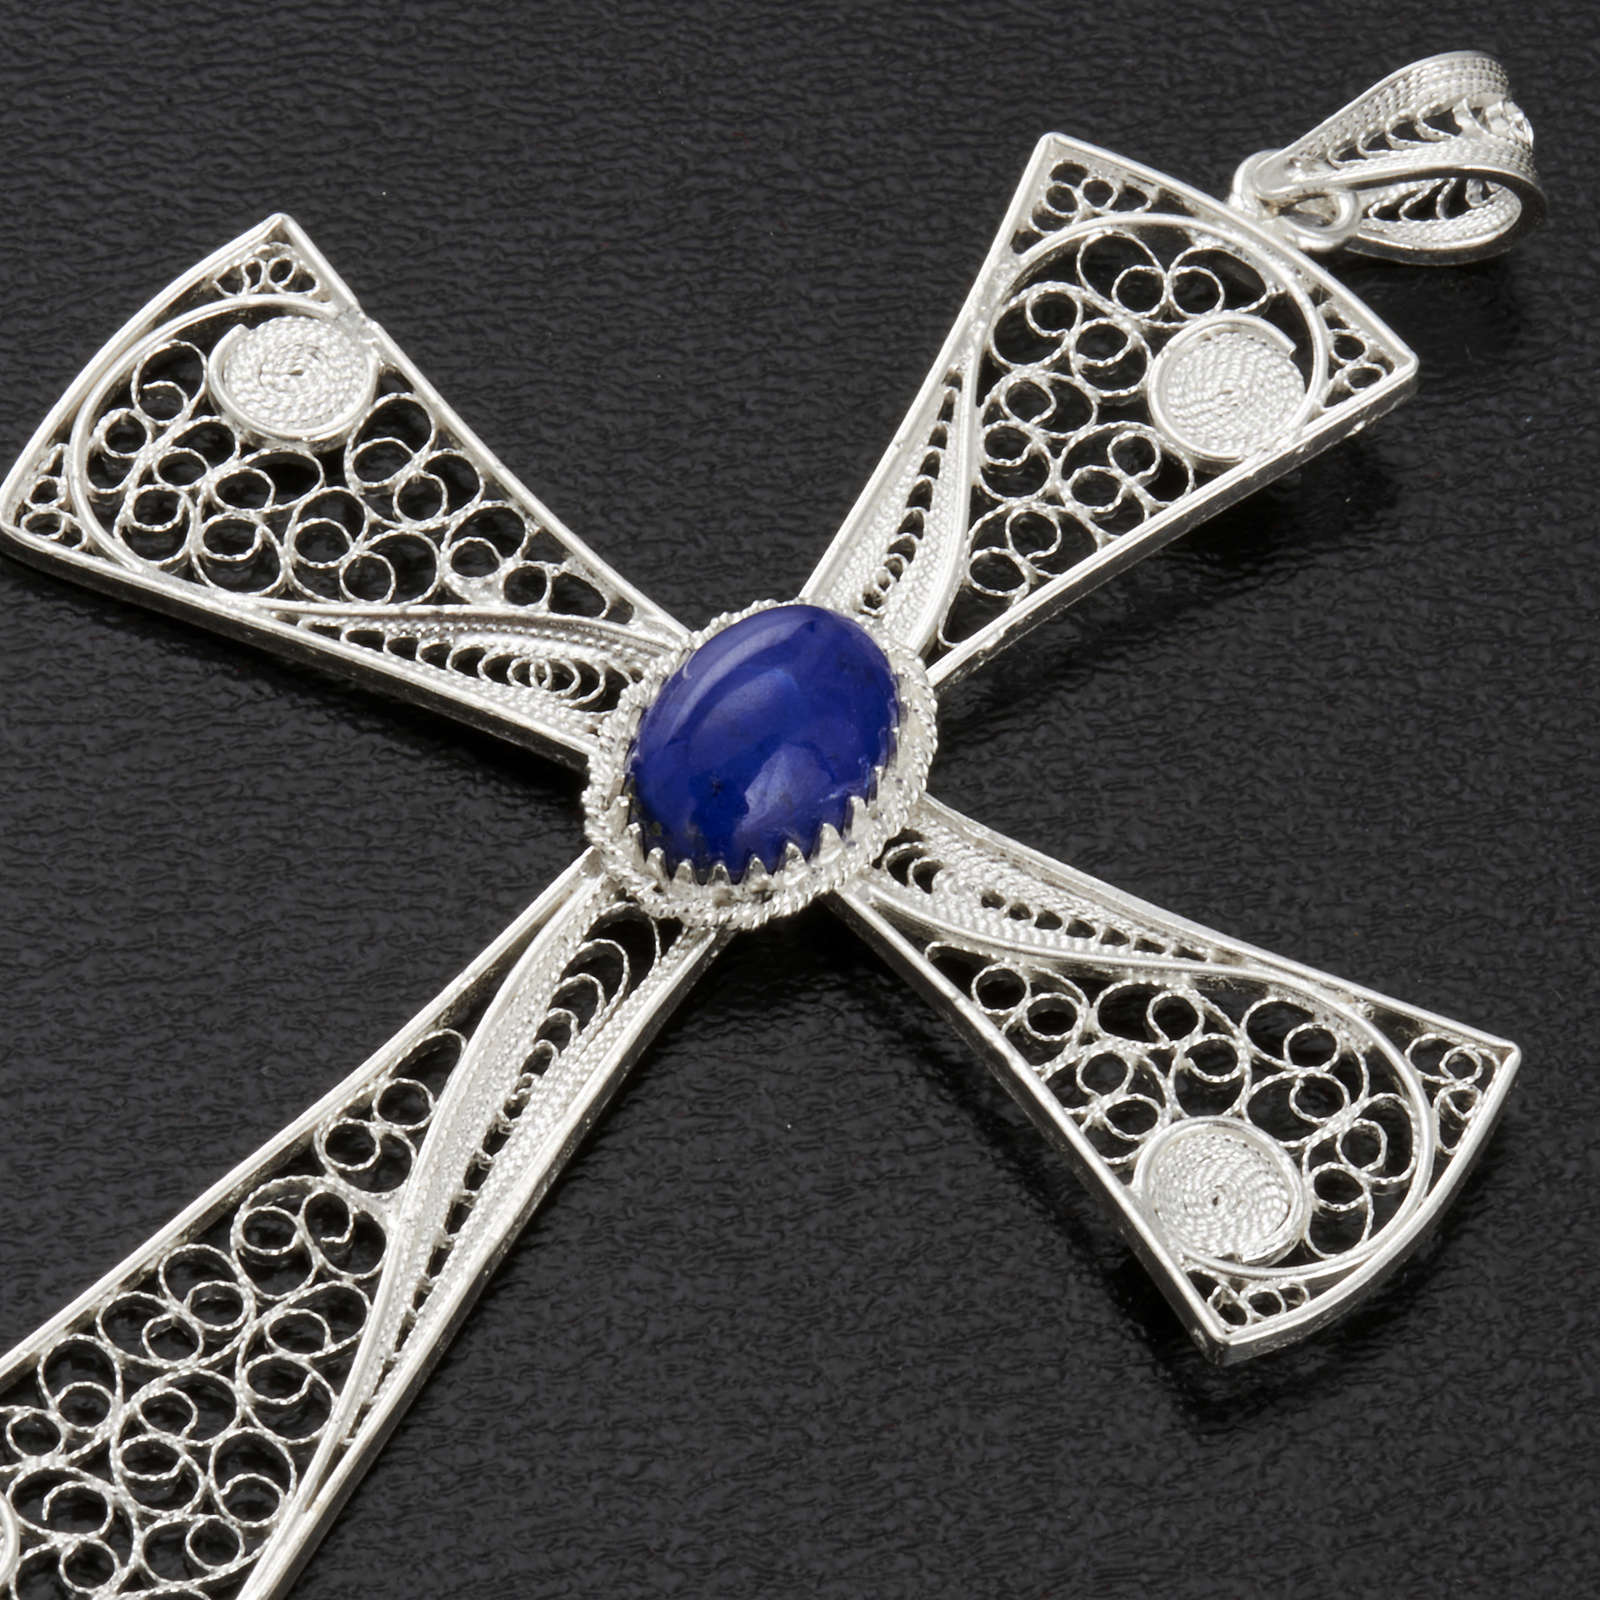 Croix pendentif lapis-lazuli filigrane d'argent 800 5,47gr 4